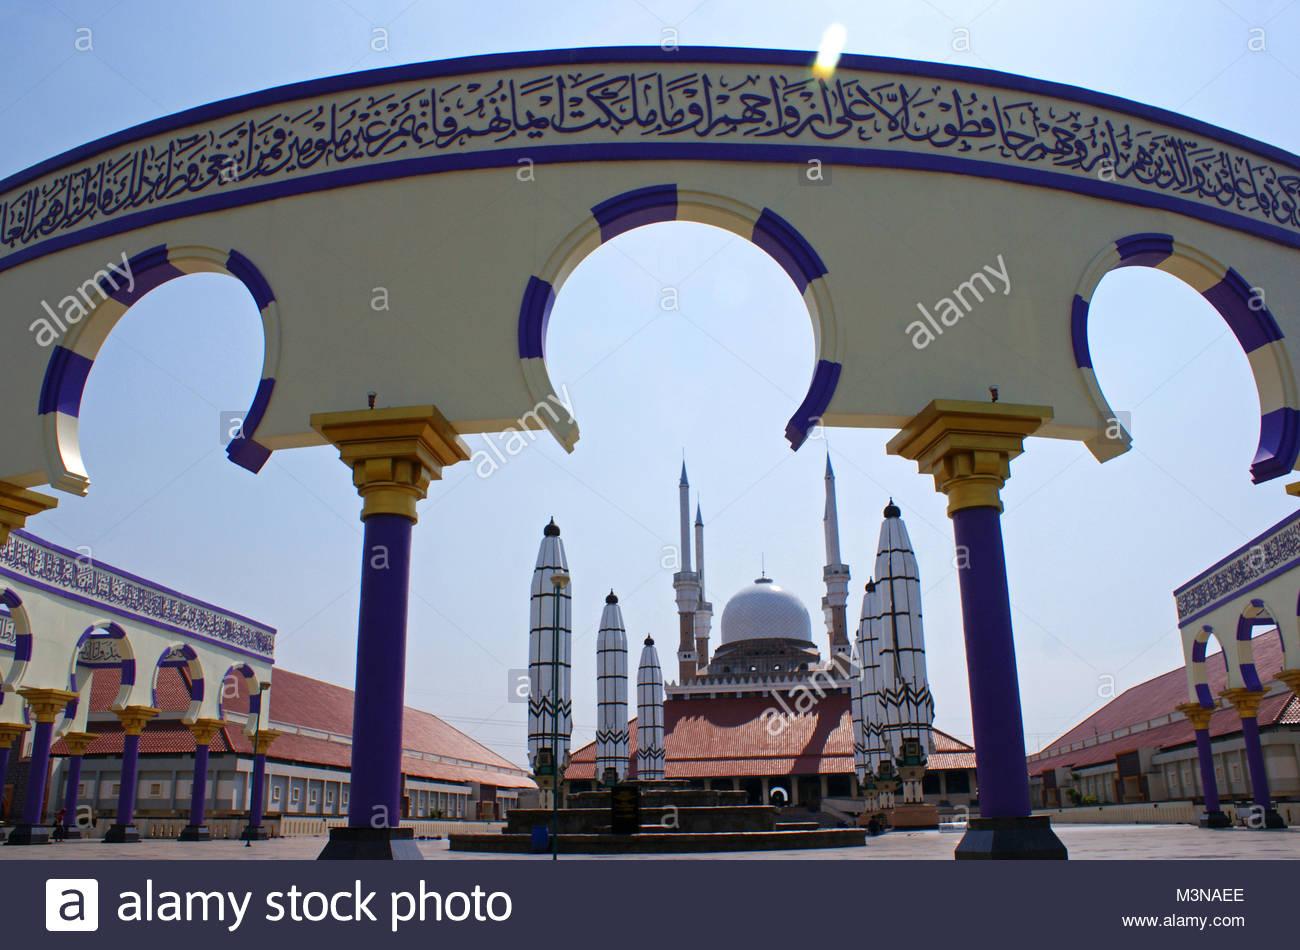 Jawa Tengah Stock Photos Images Alamy Masjid Agung Semarang Central